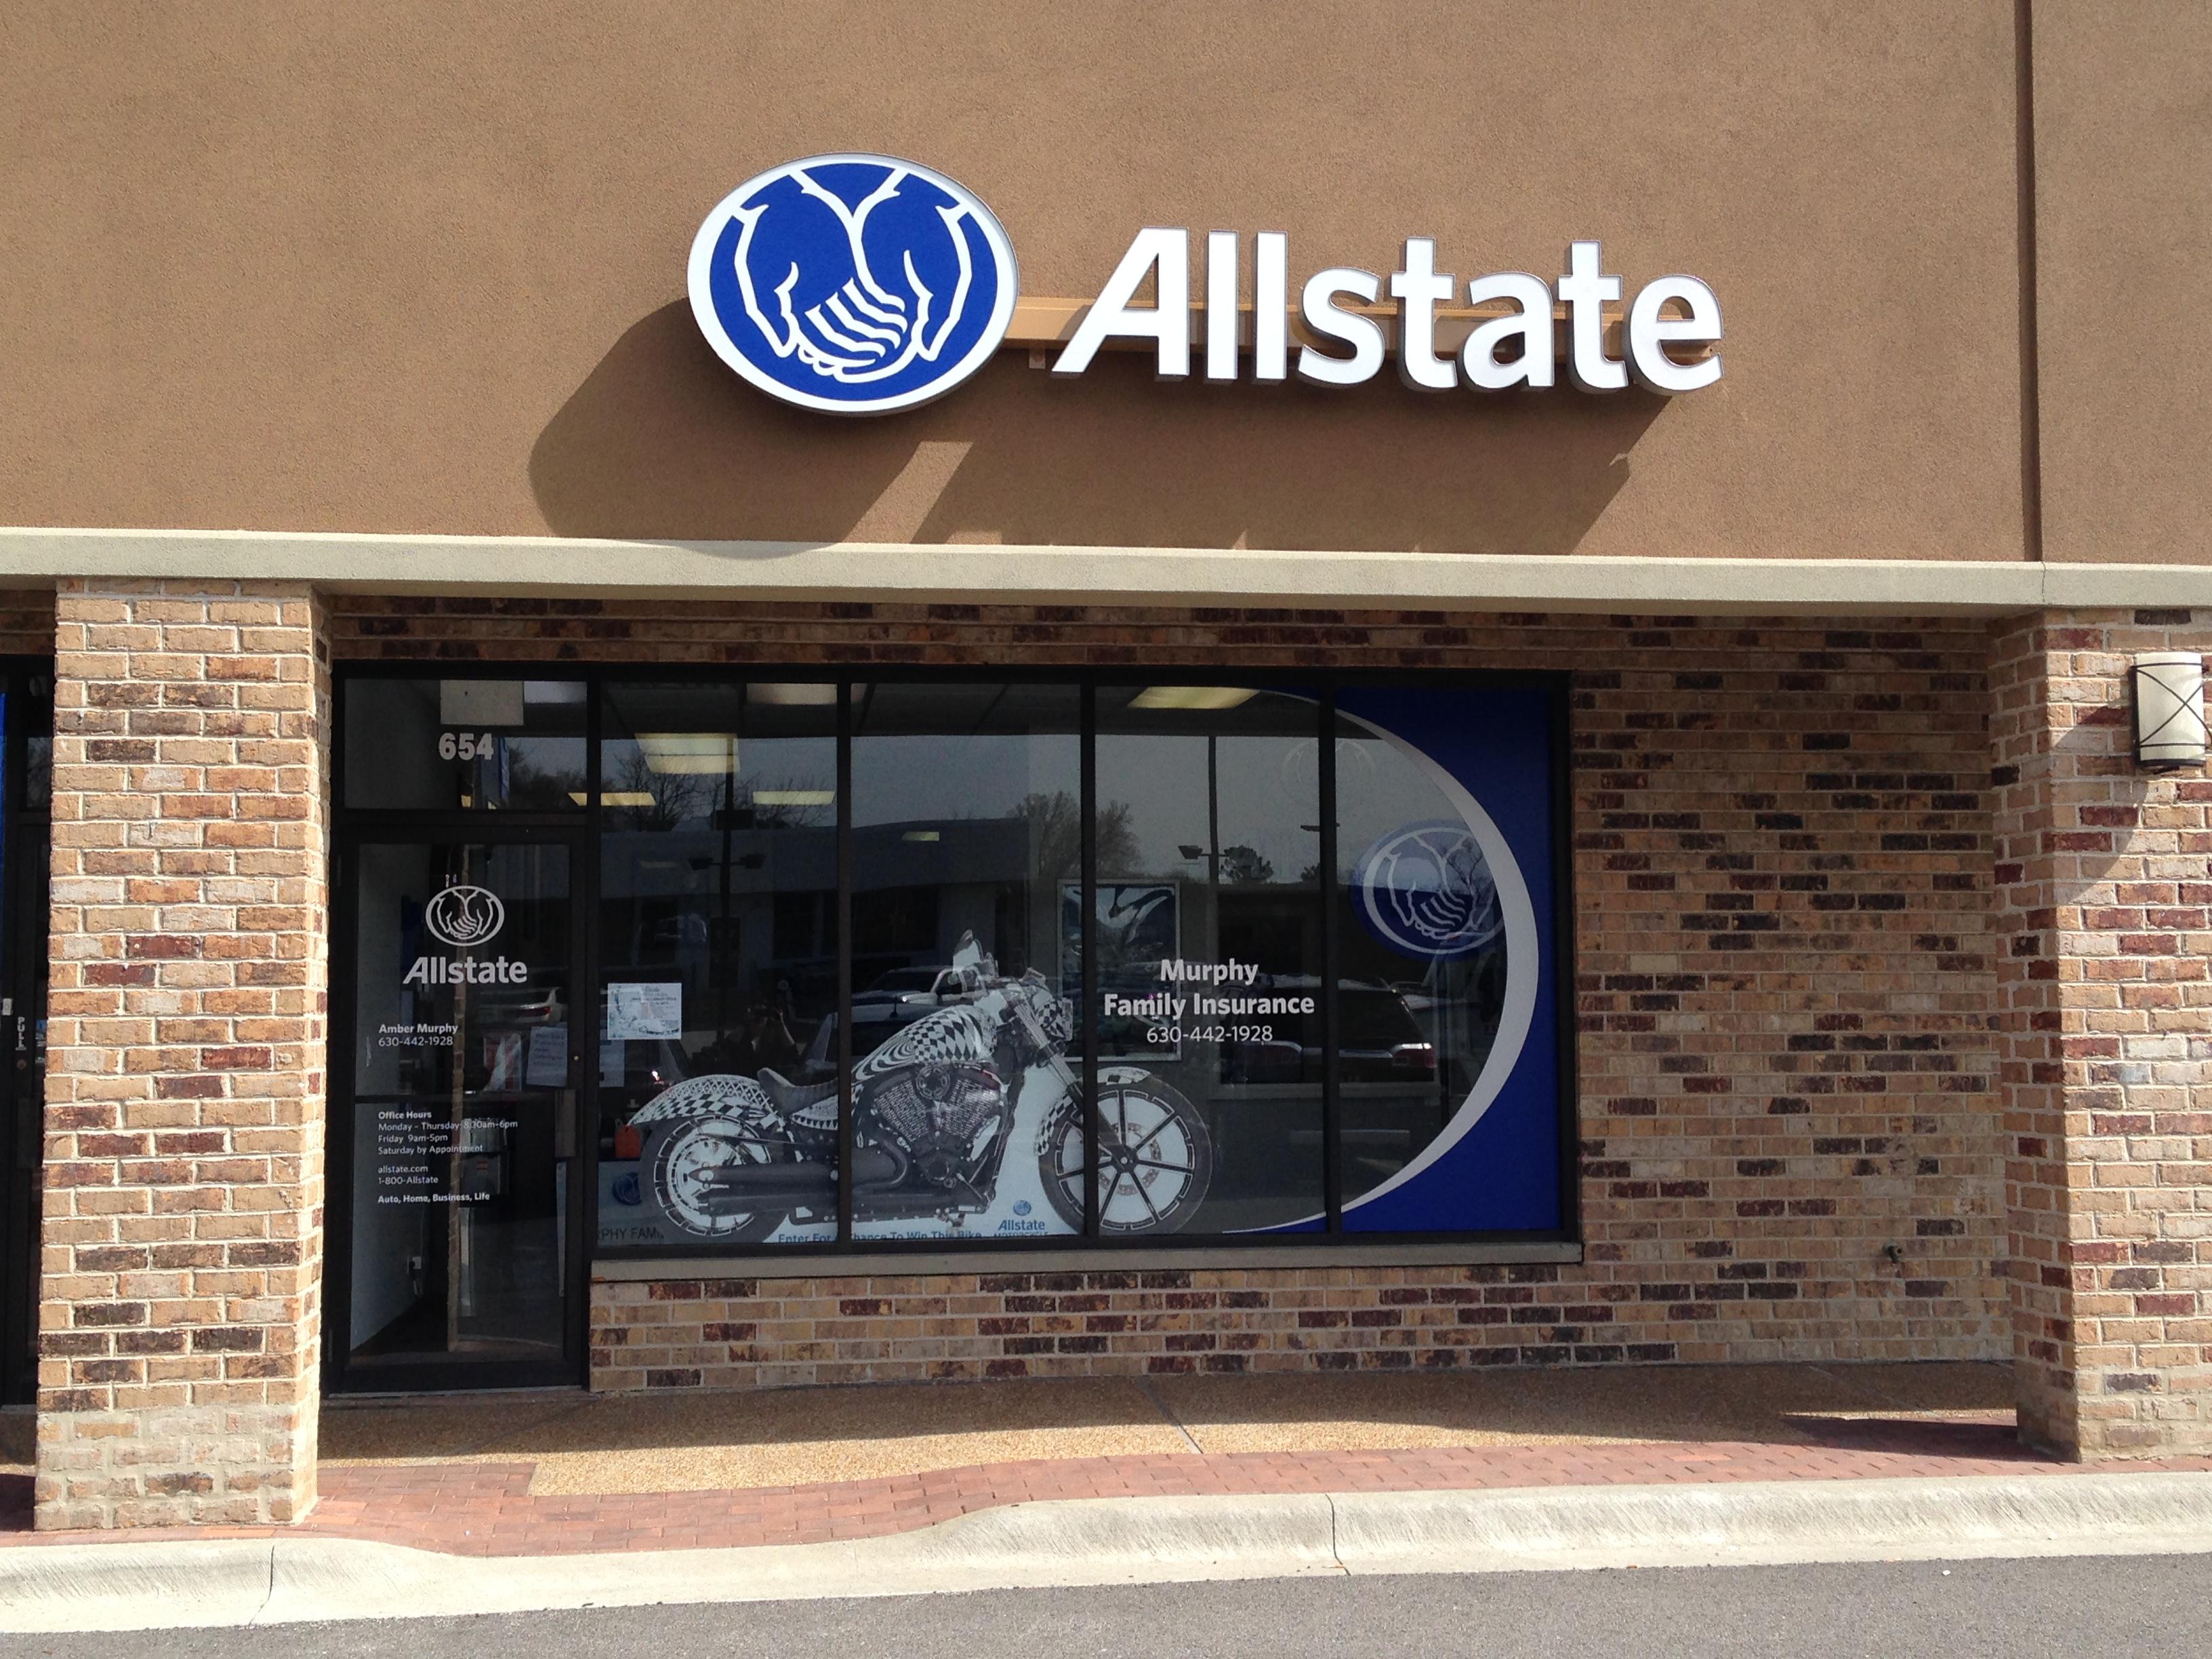 Murphy Family Insurance: Allstate Insurance image 1